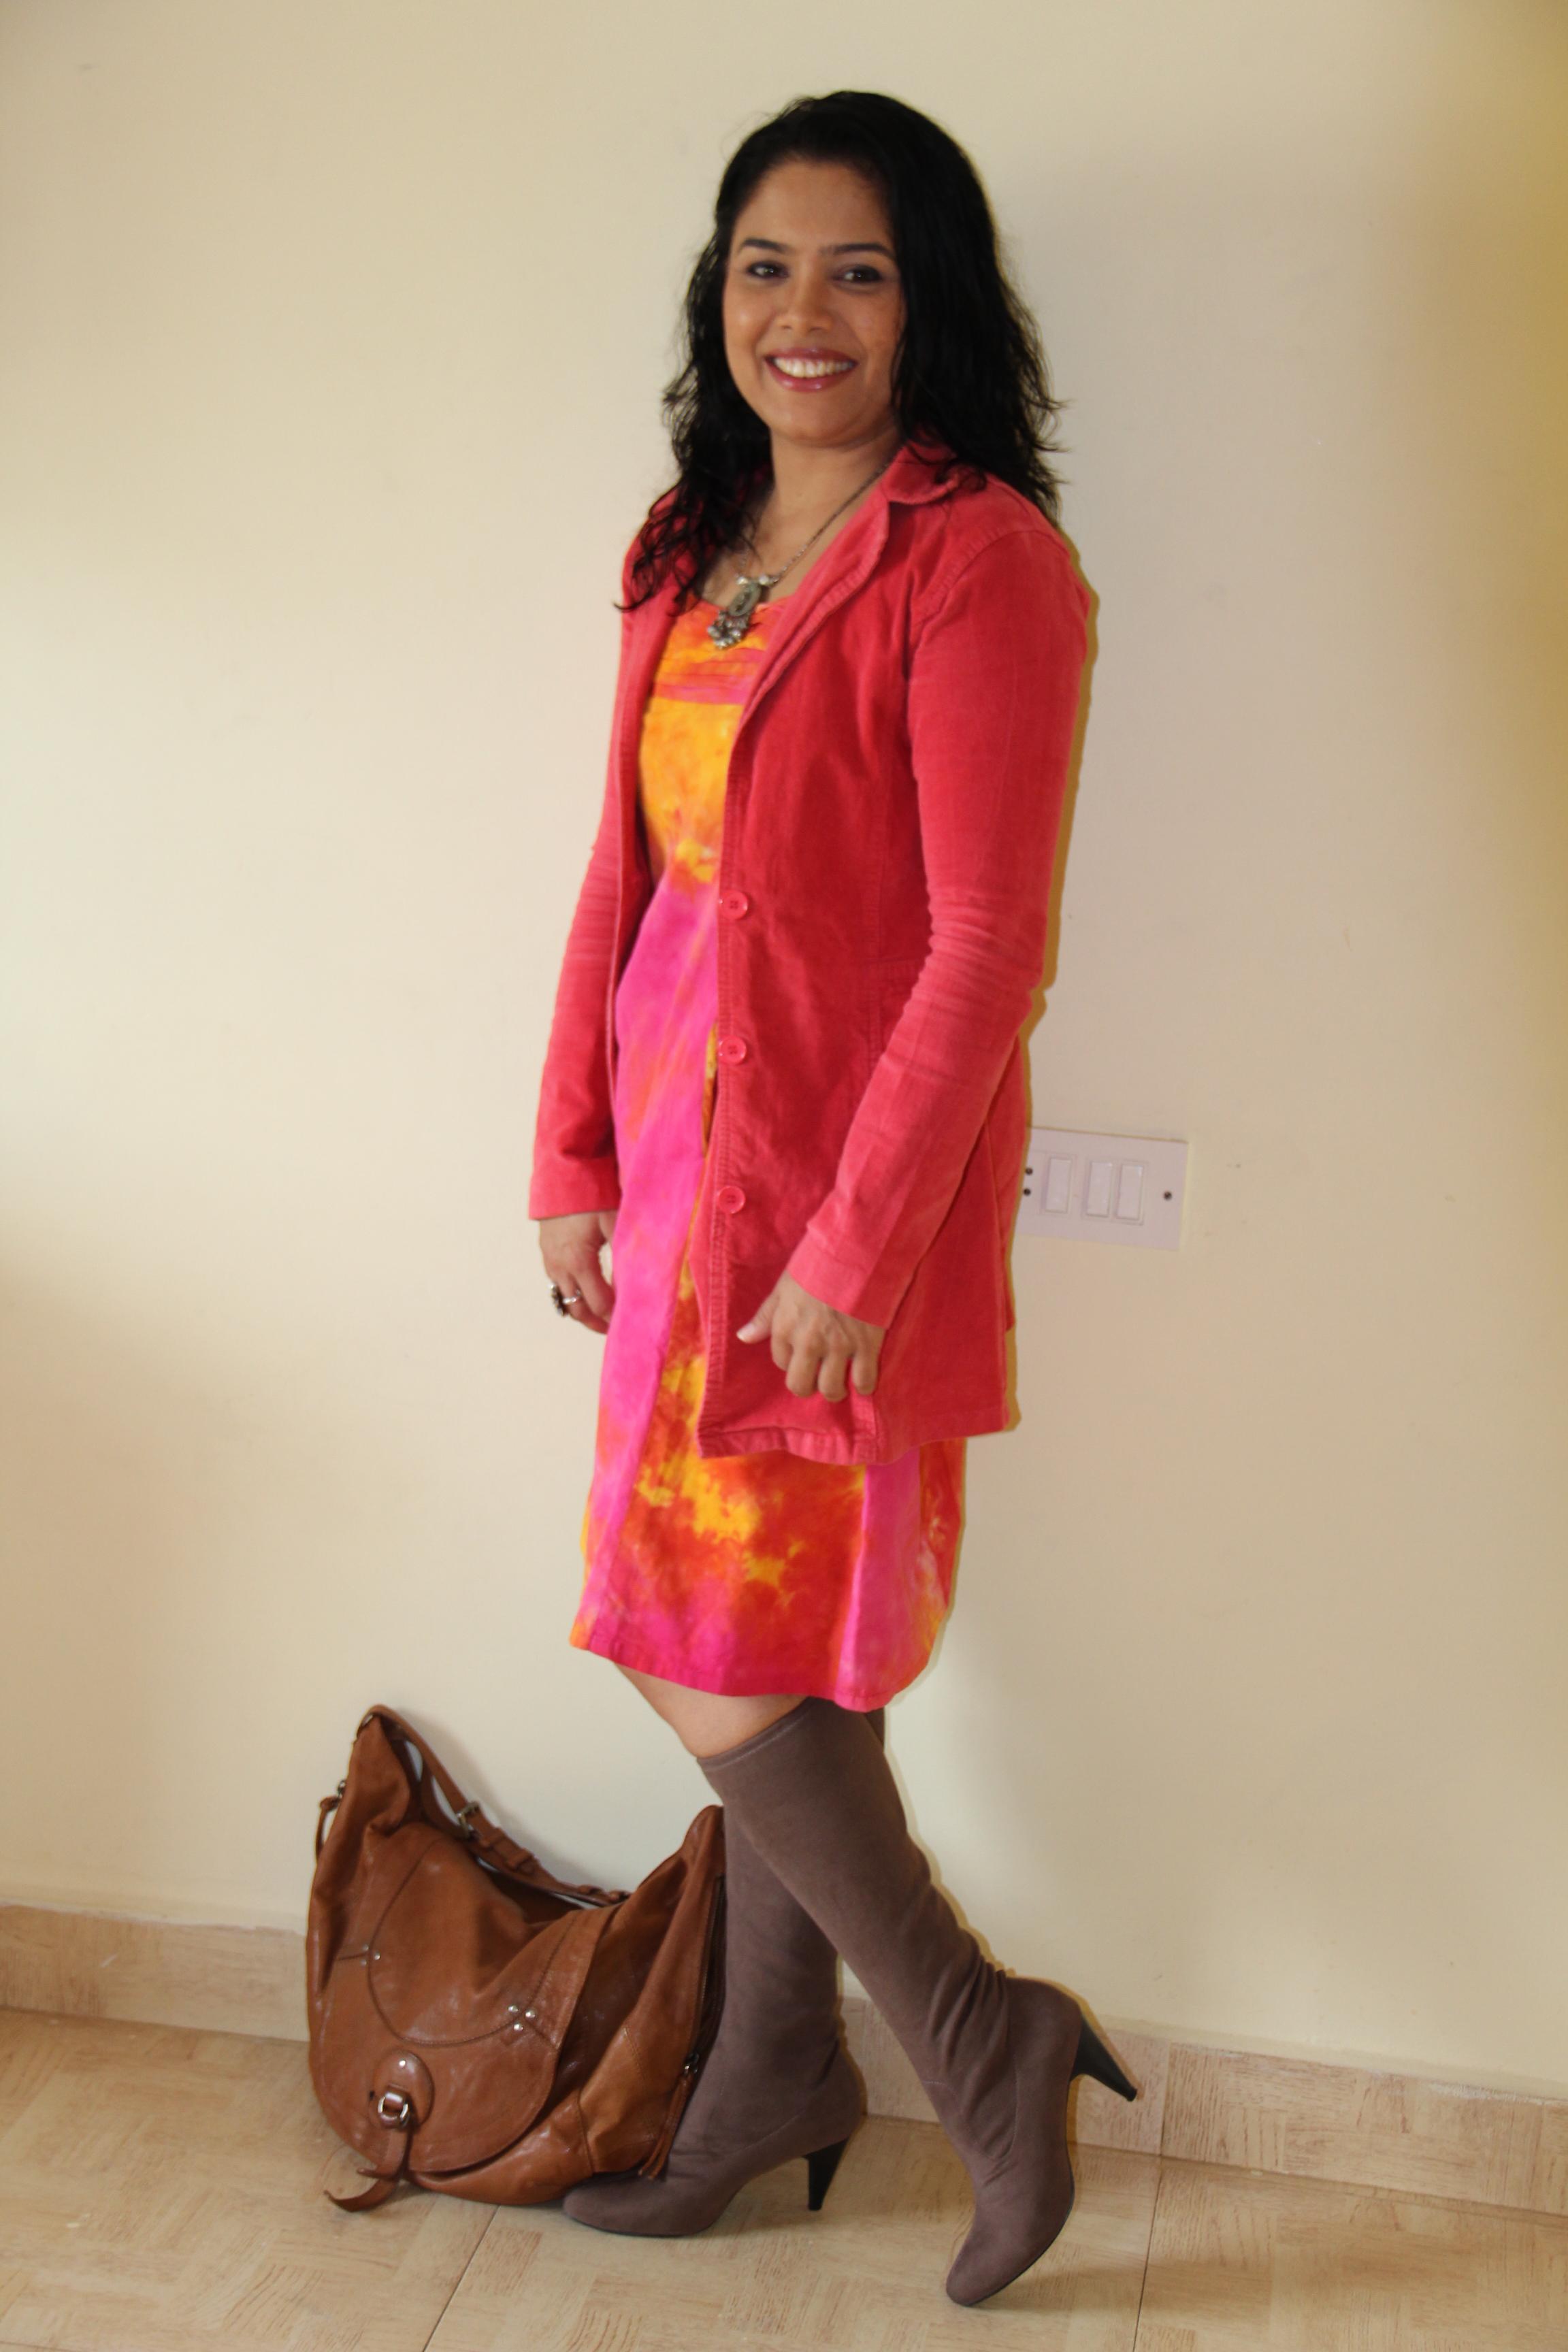 Beautiful Girls Nd Boots Indian Photos Mount Mercy University